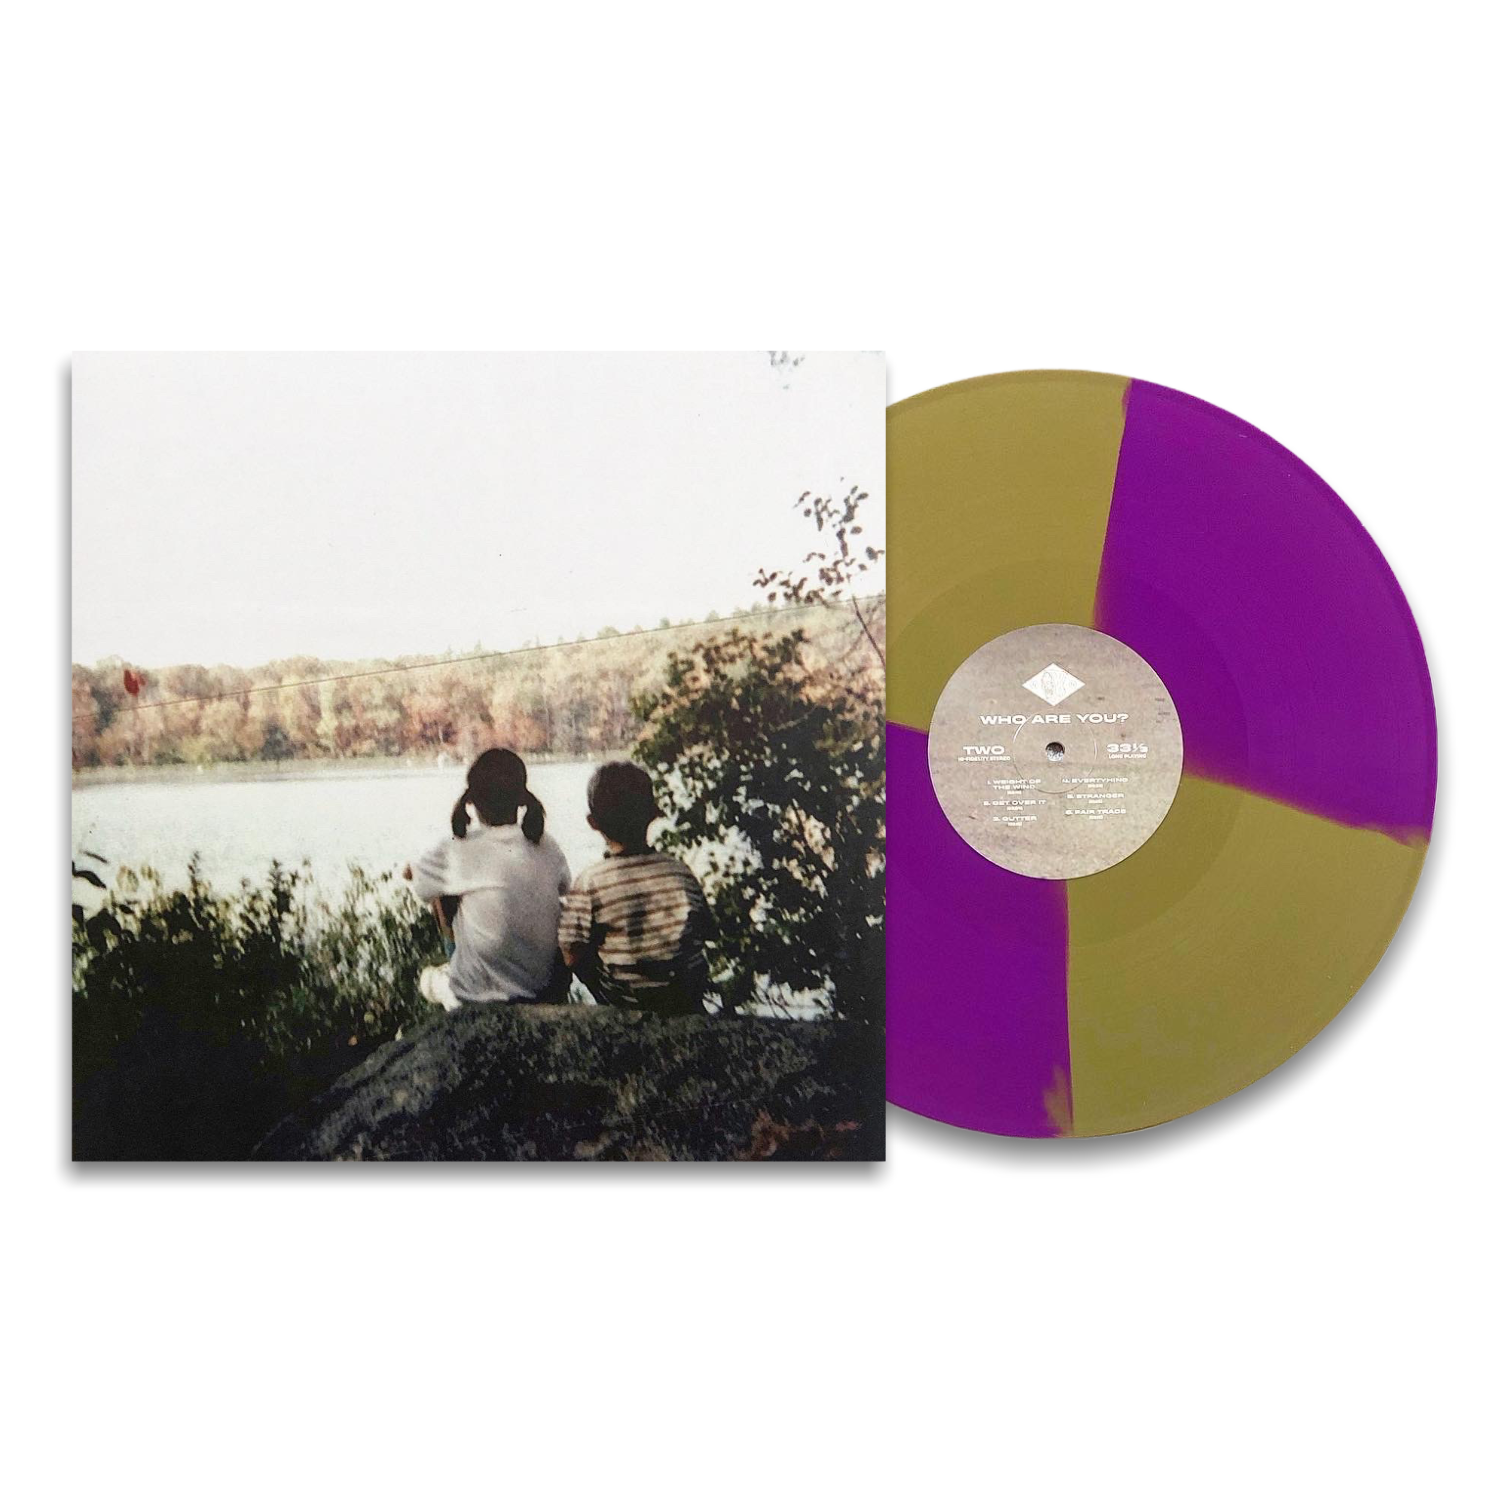 Three LP Bundle (NN LP, Bummer/Who Are You LP, The Singles LP)